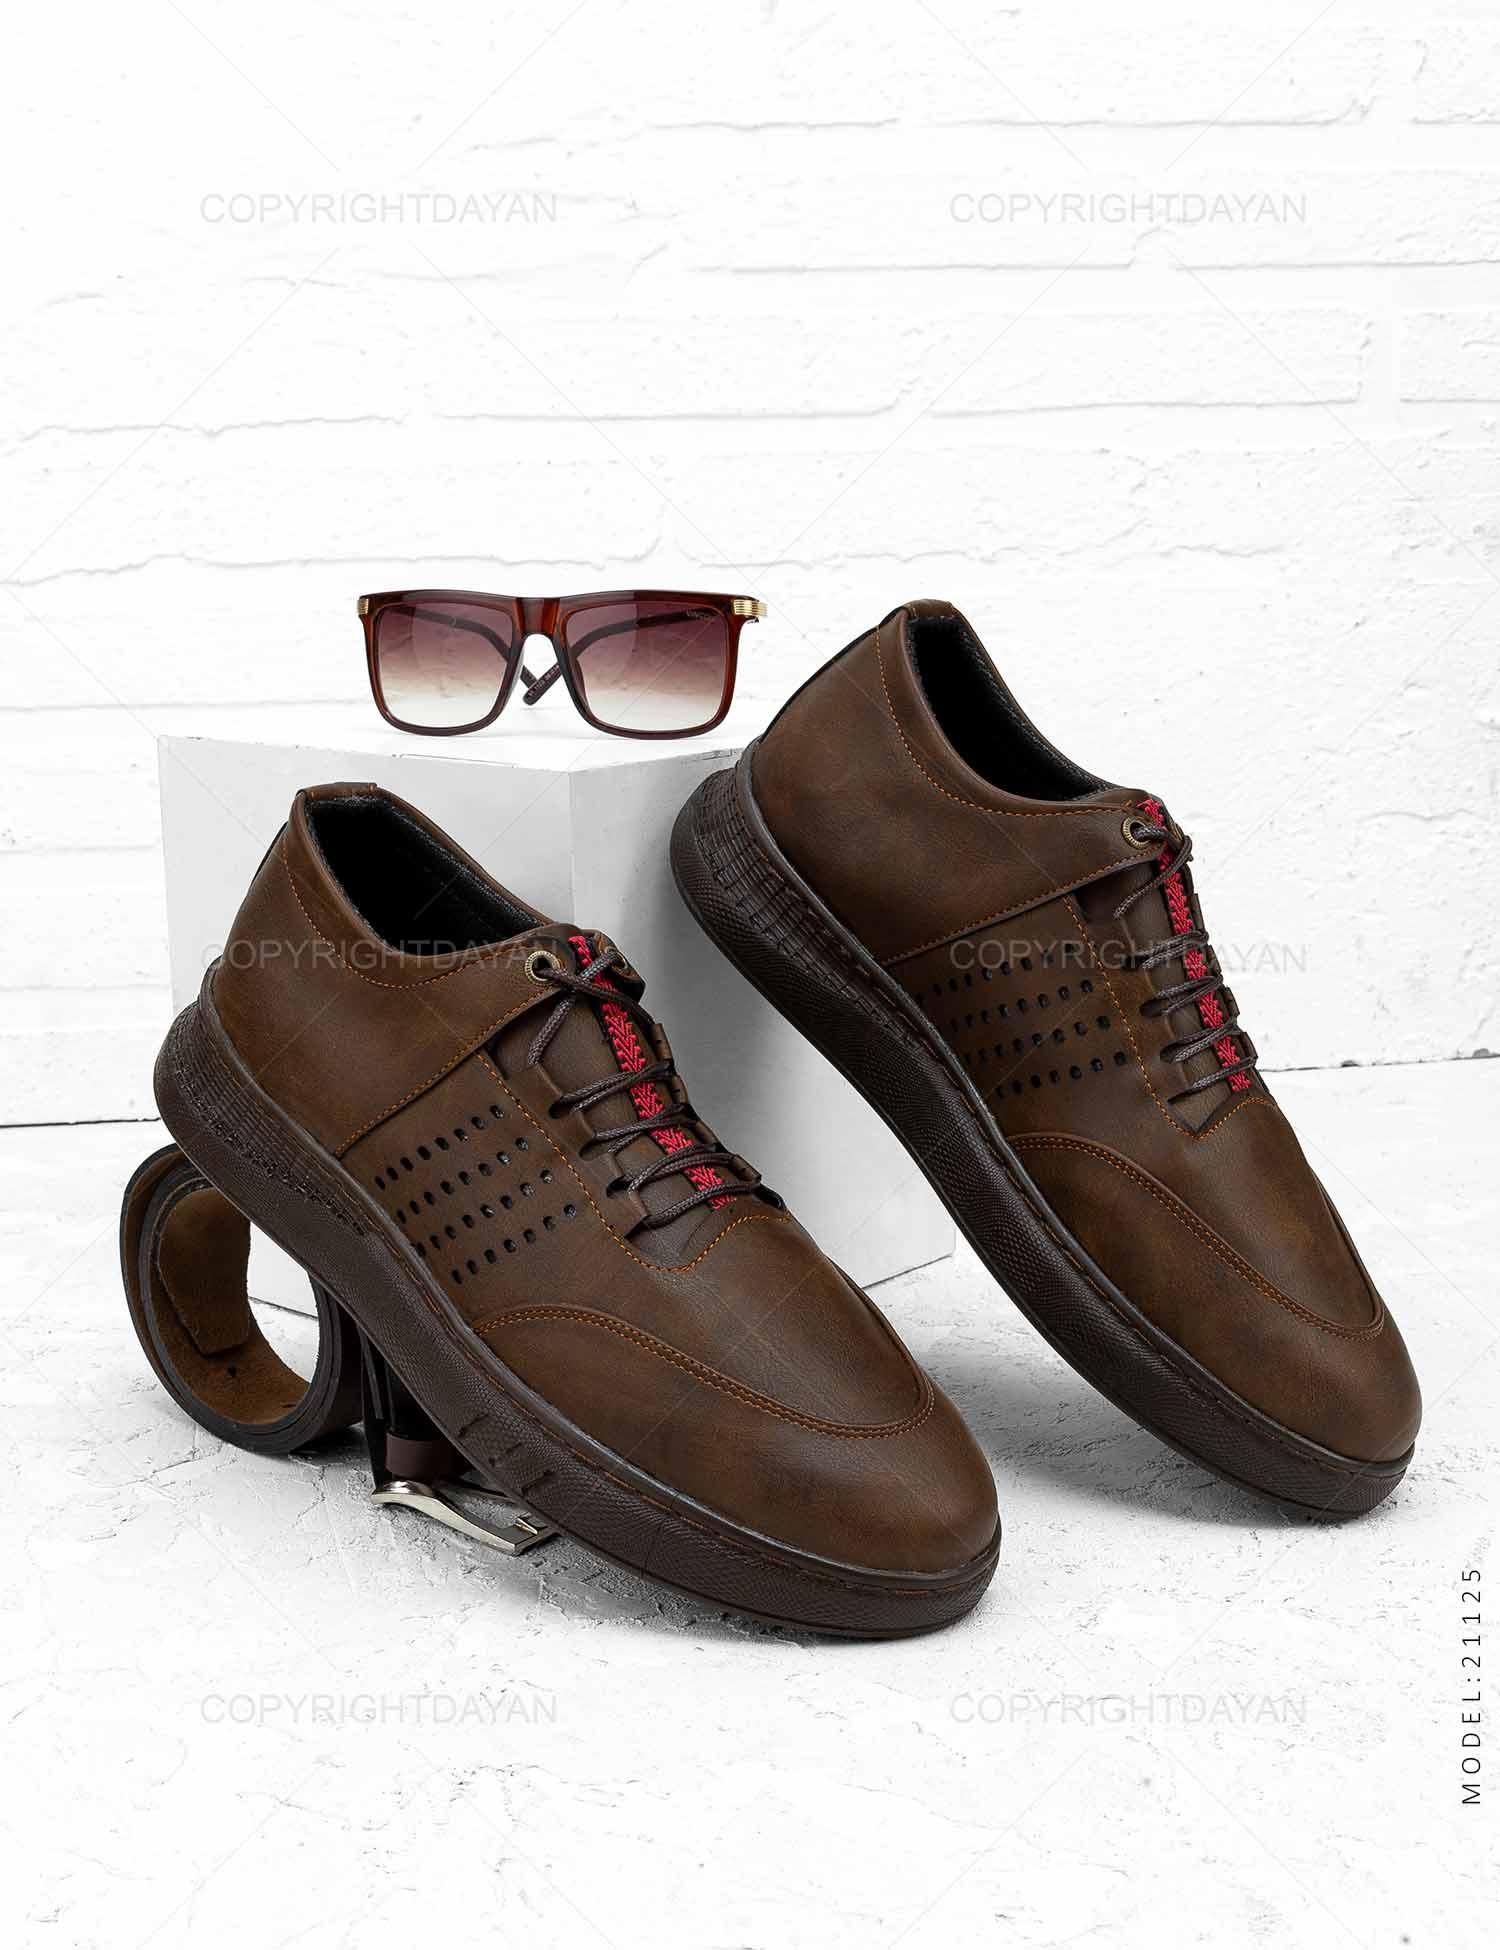 کفش روزمره مردانه Rayan مدل 21125